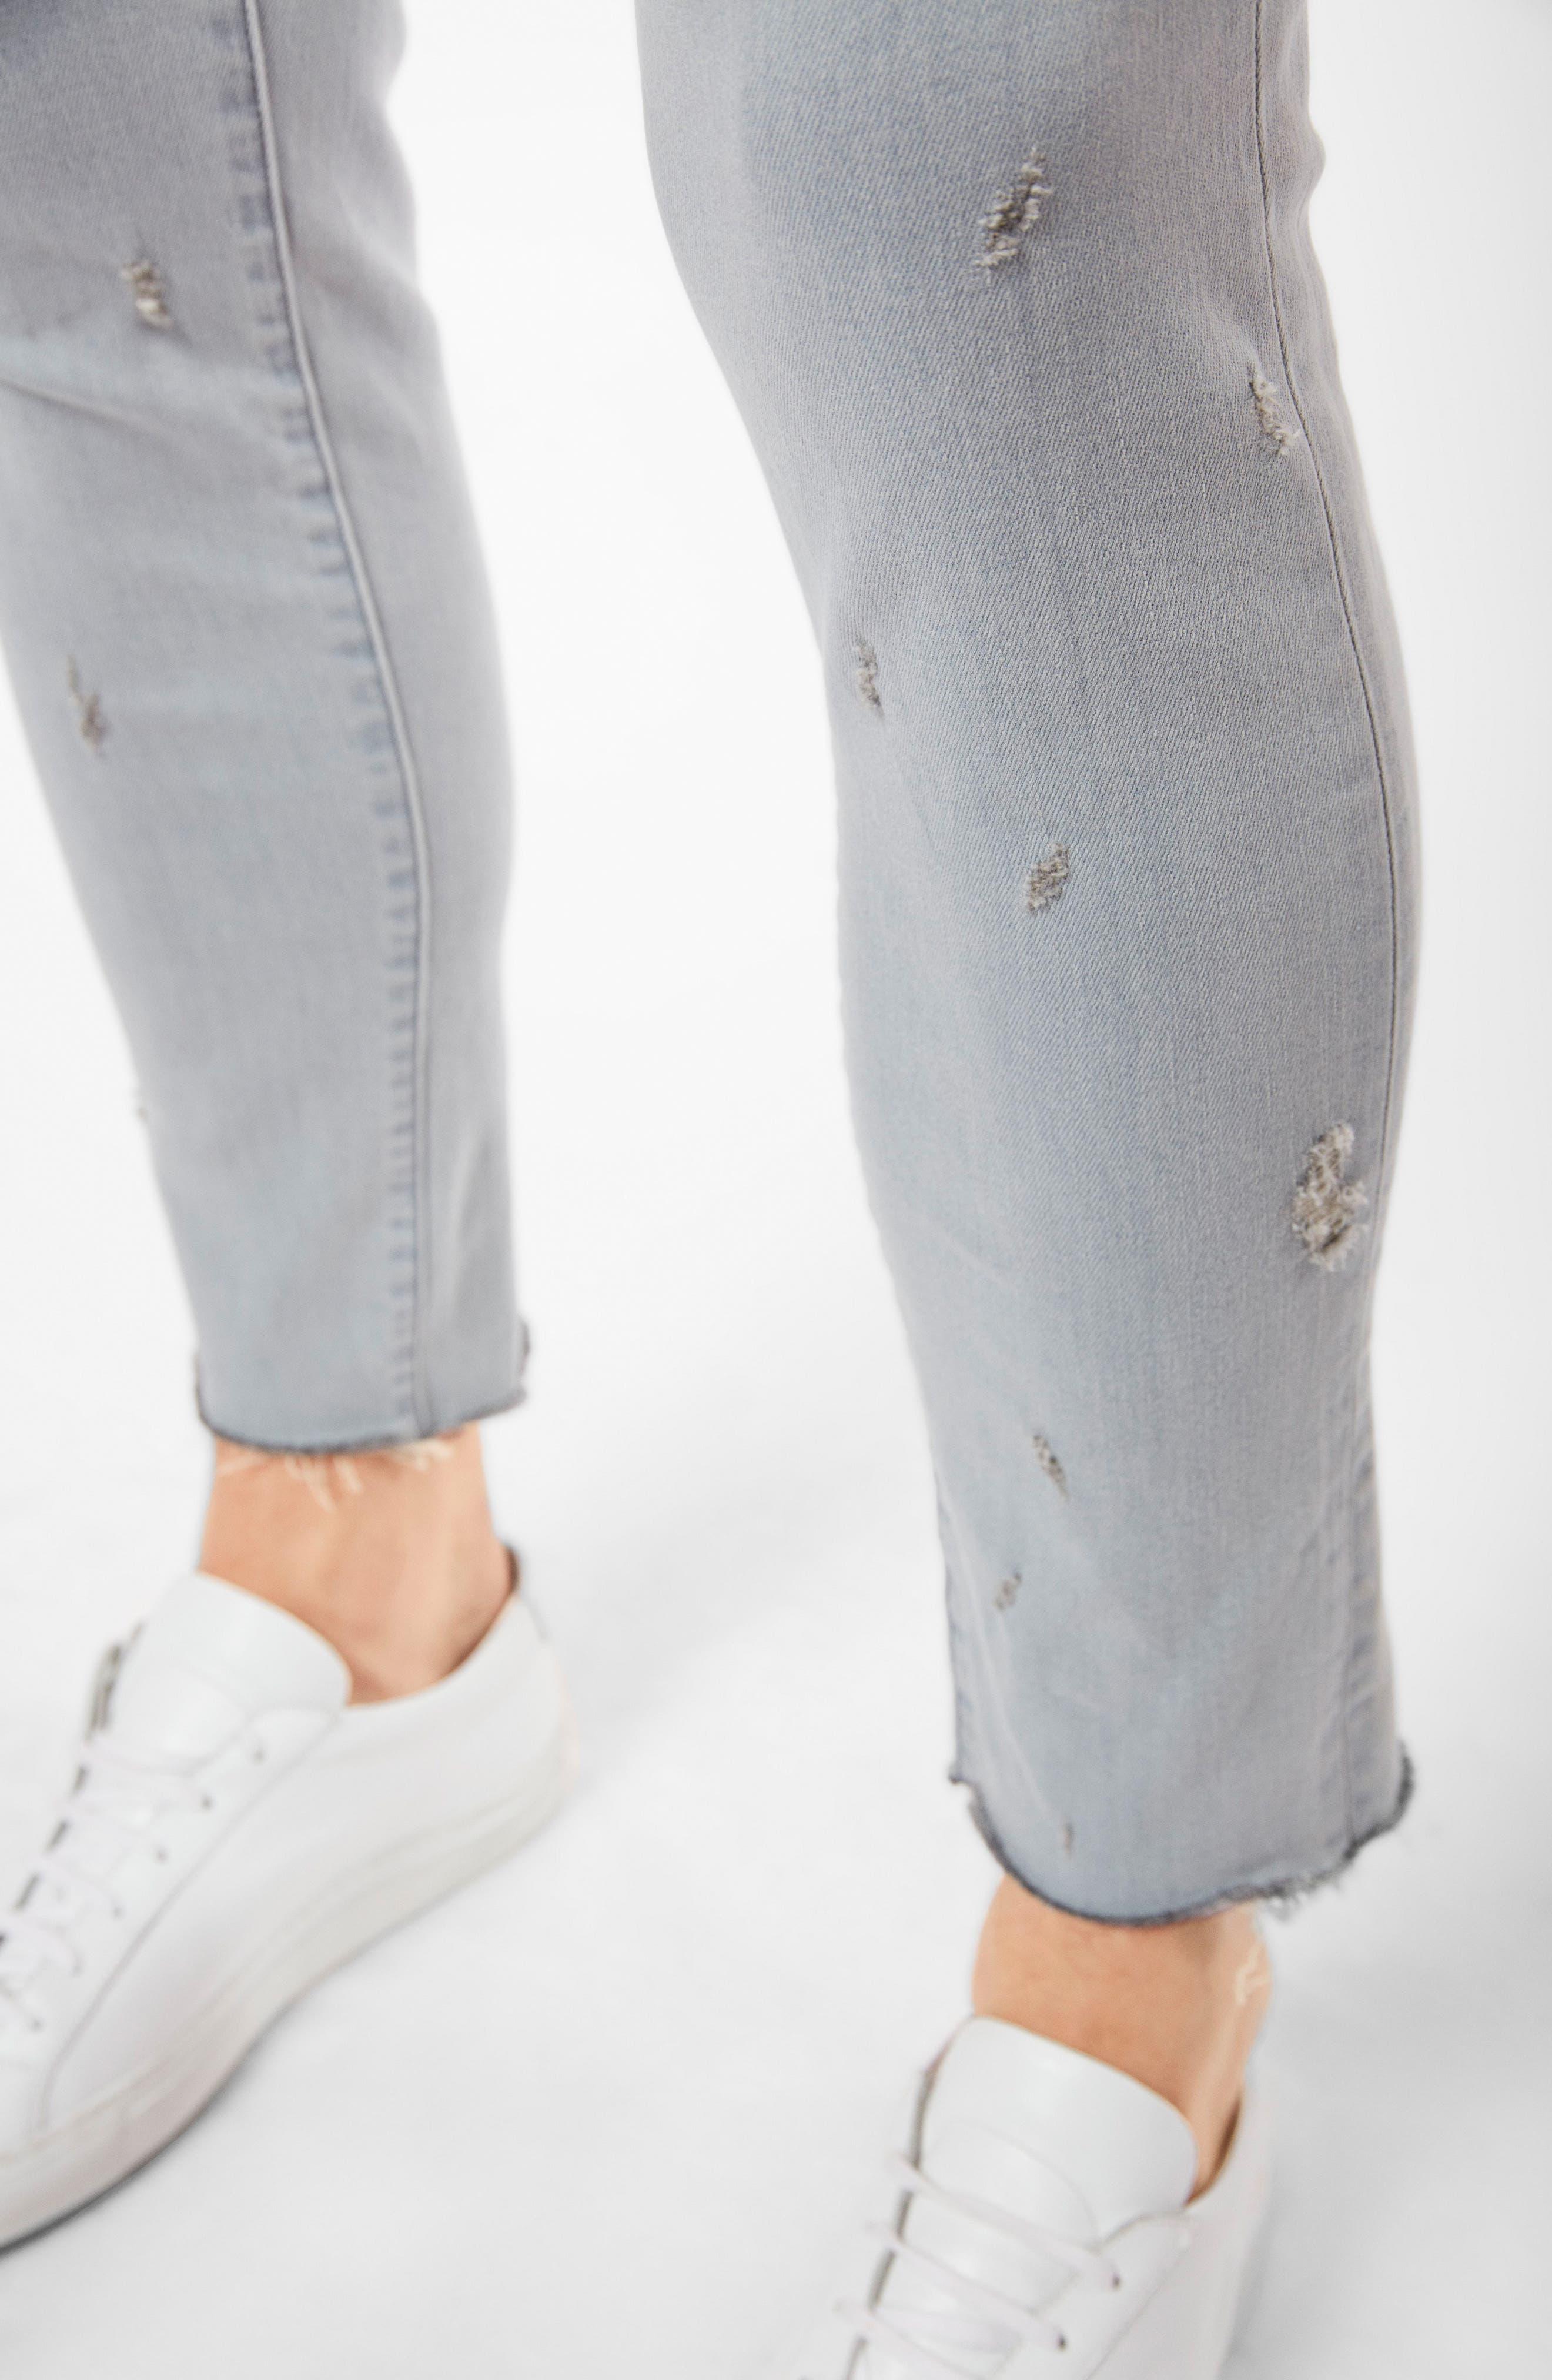 Tyler Slim Fit Jeans,                             Alternate thumbnail 6, color,                             Trounced Porpoise